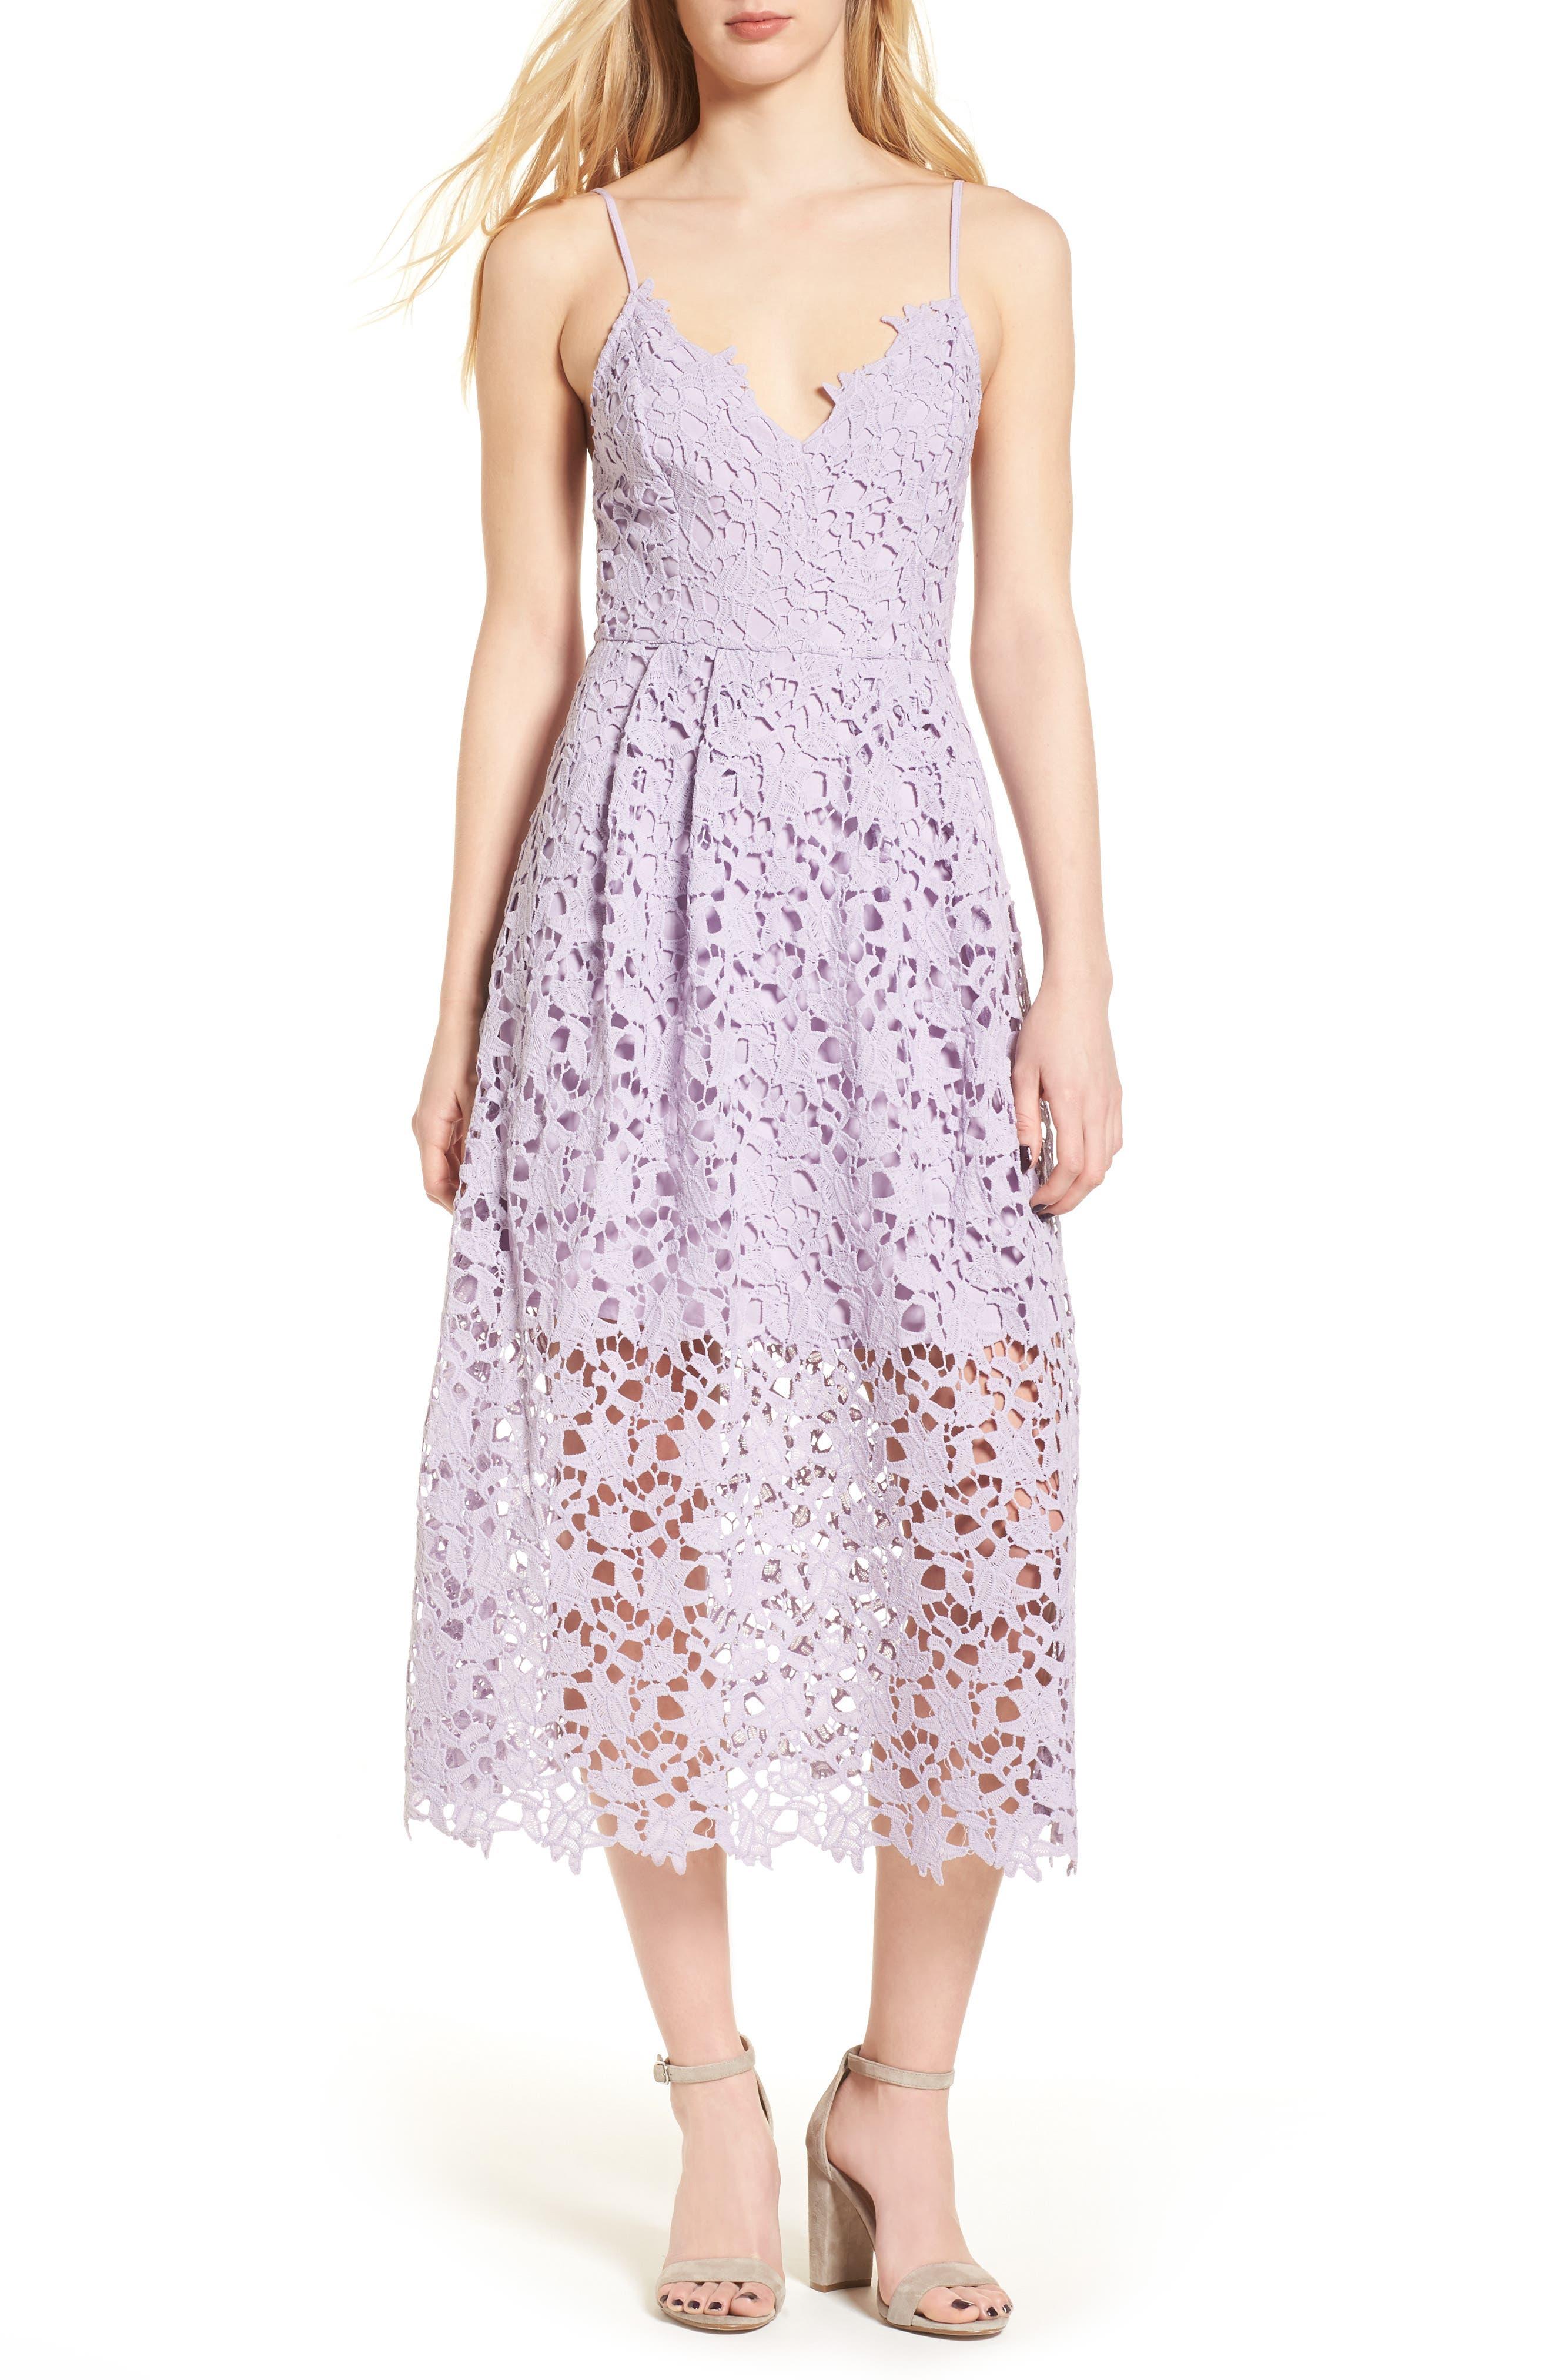 ASTR THE LABEL Lace Midi Dress, Main, color, LILAC